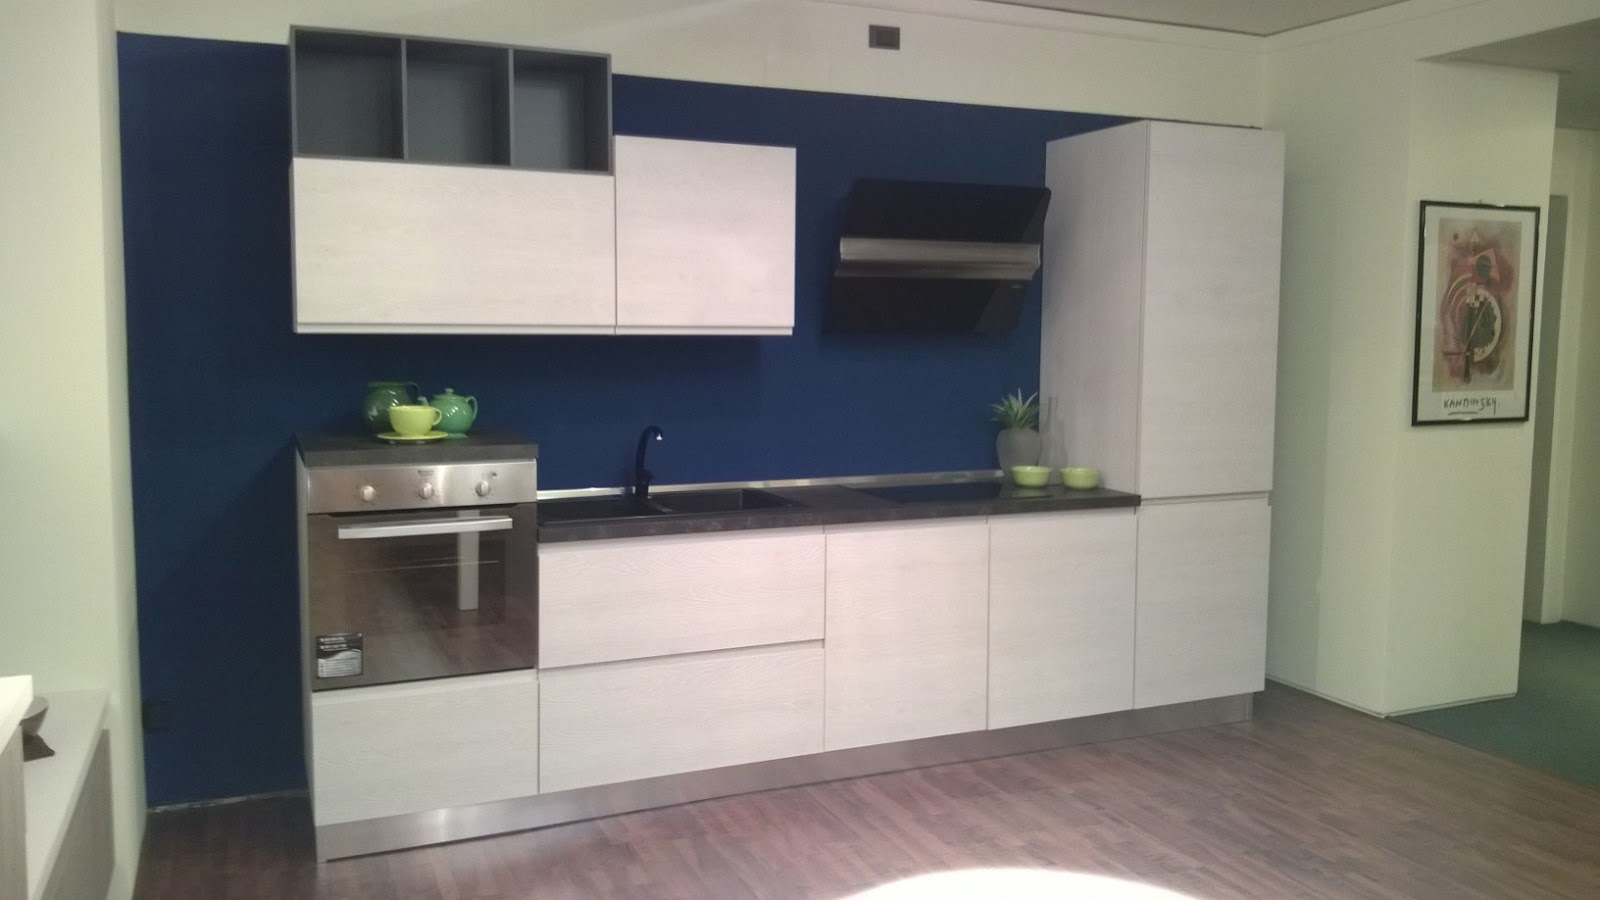 Arredamenti pennati le cucine esposte design di qualit - Anta cucina laminato ...